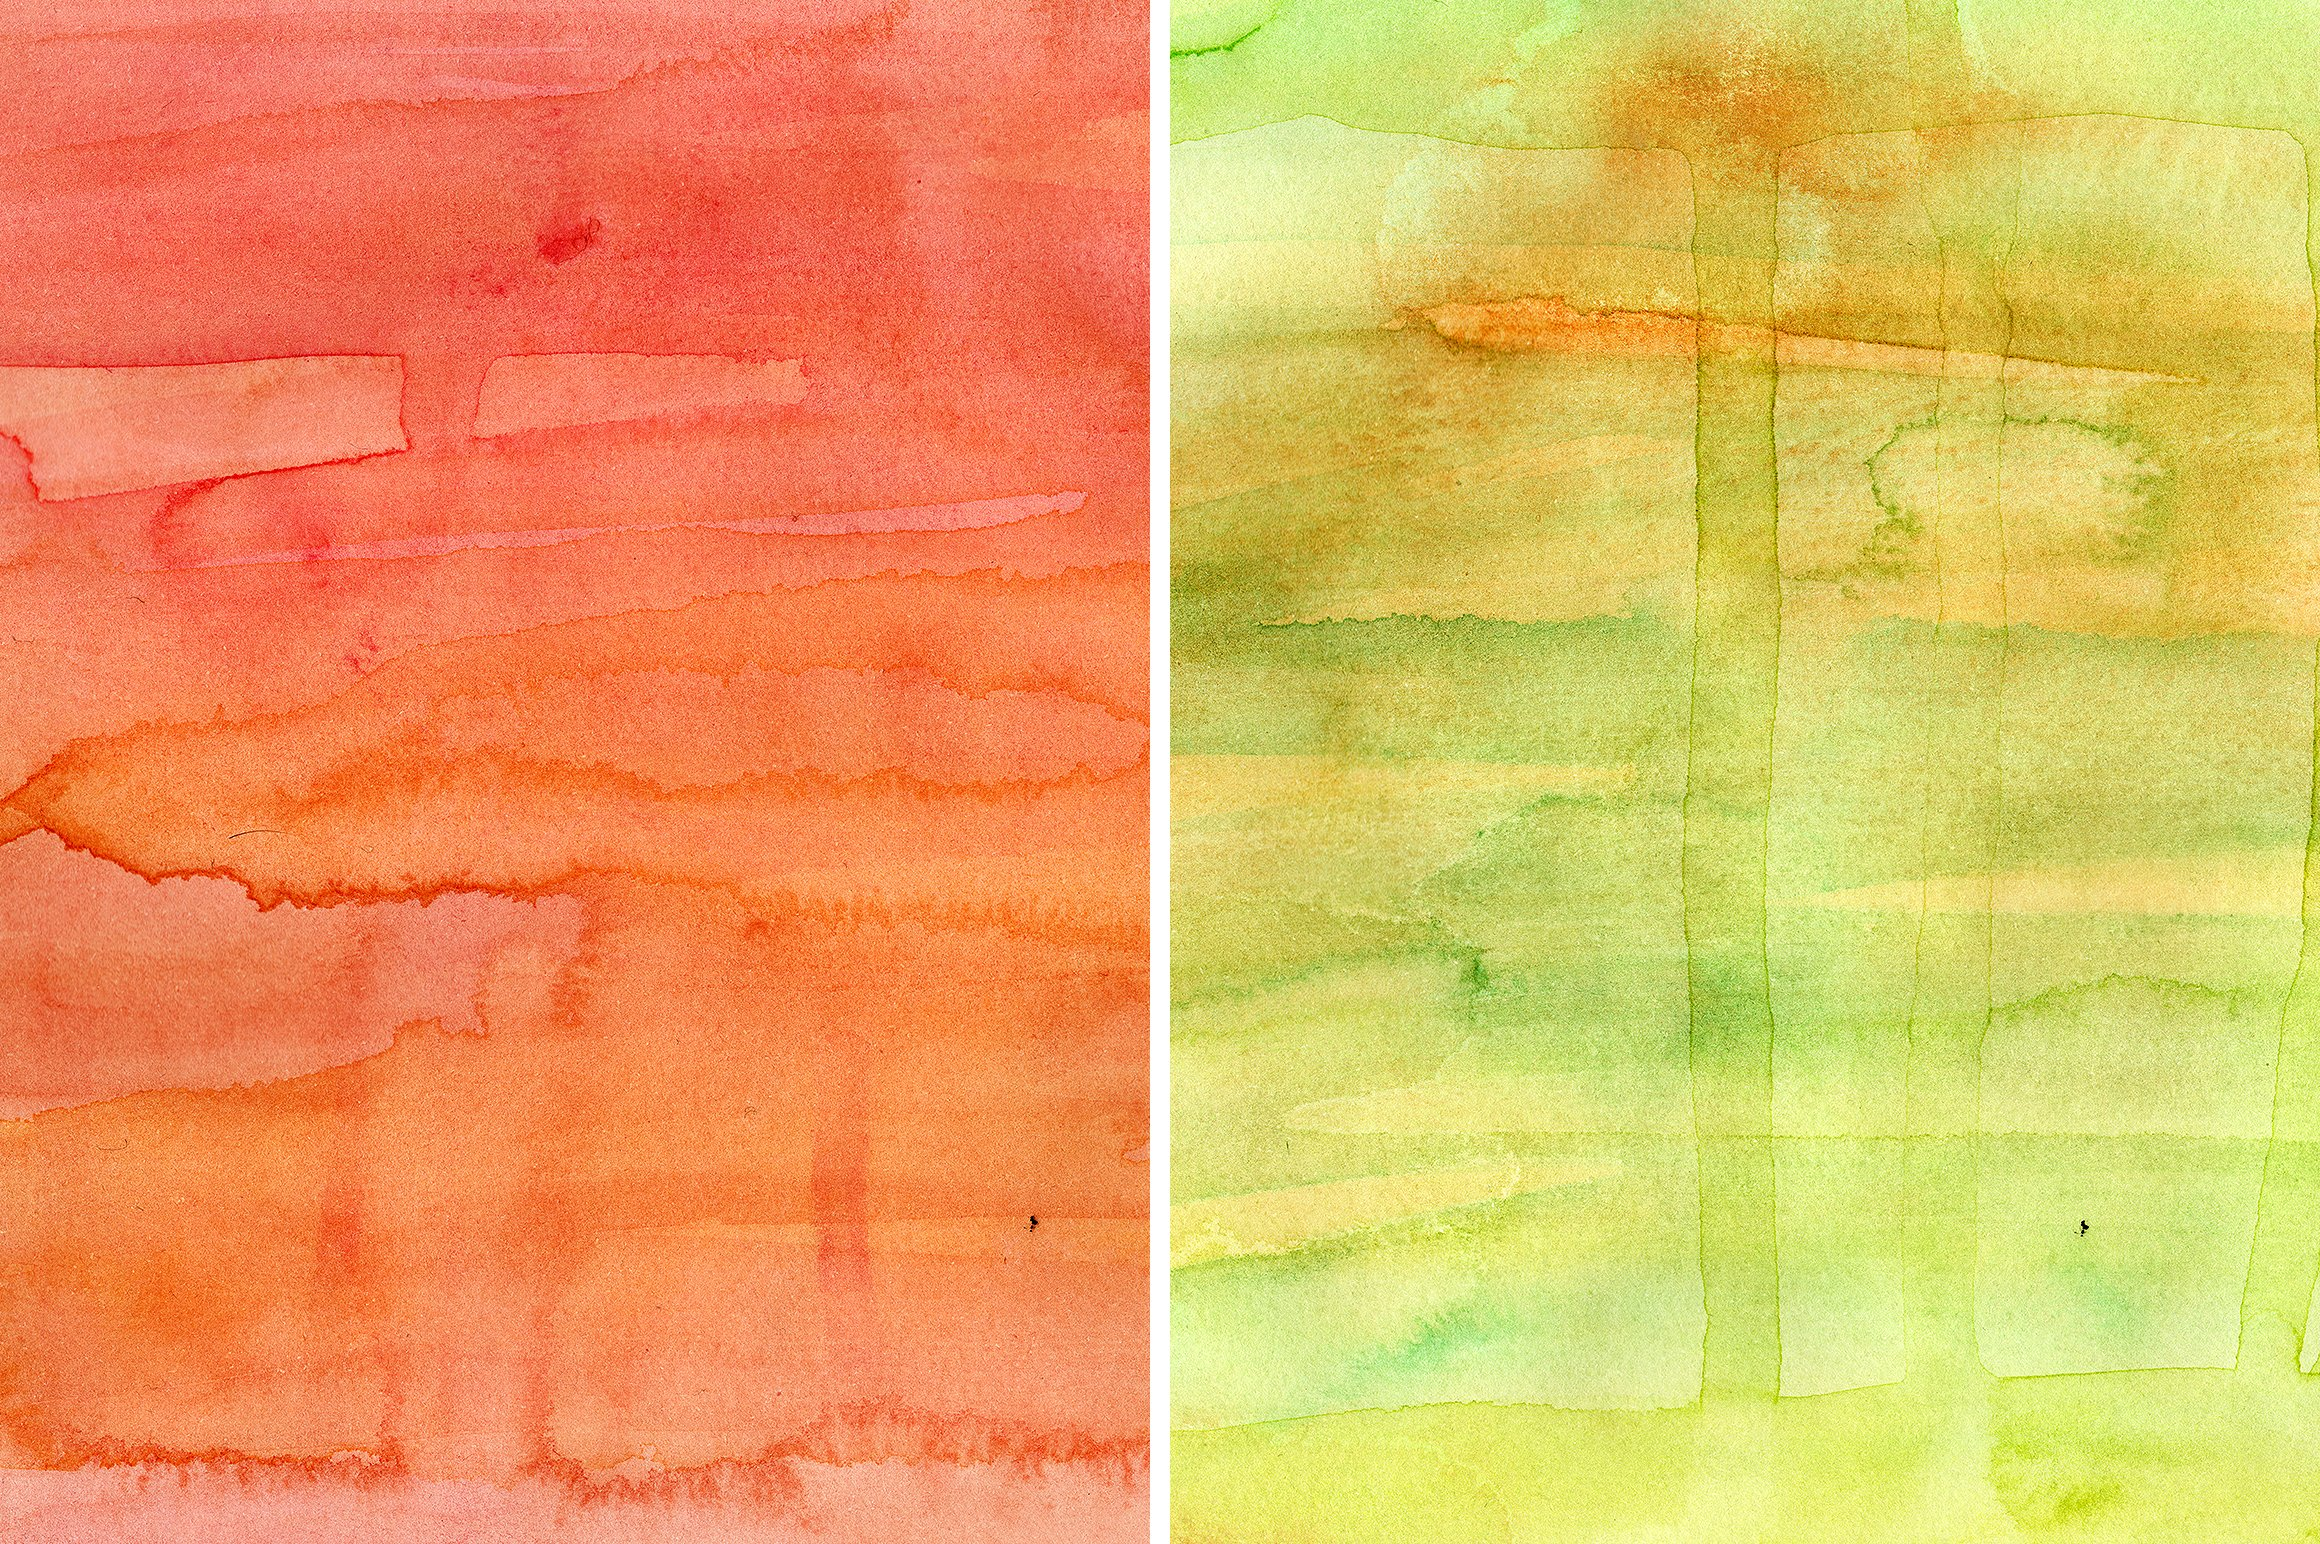 11款高清水彩颜料渗透流动痕迹背景图片素材 Watercolor Washes Textures Volume 01插图(4)